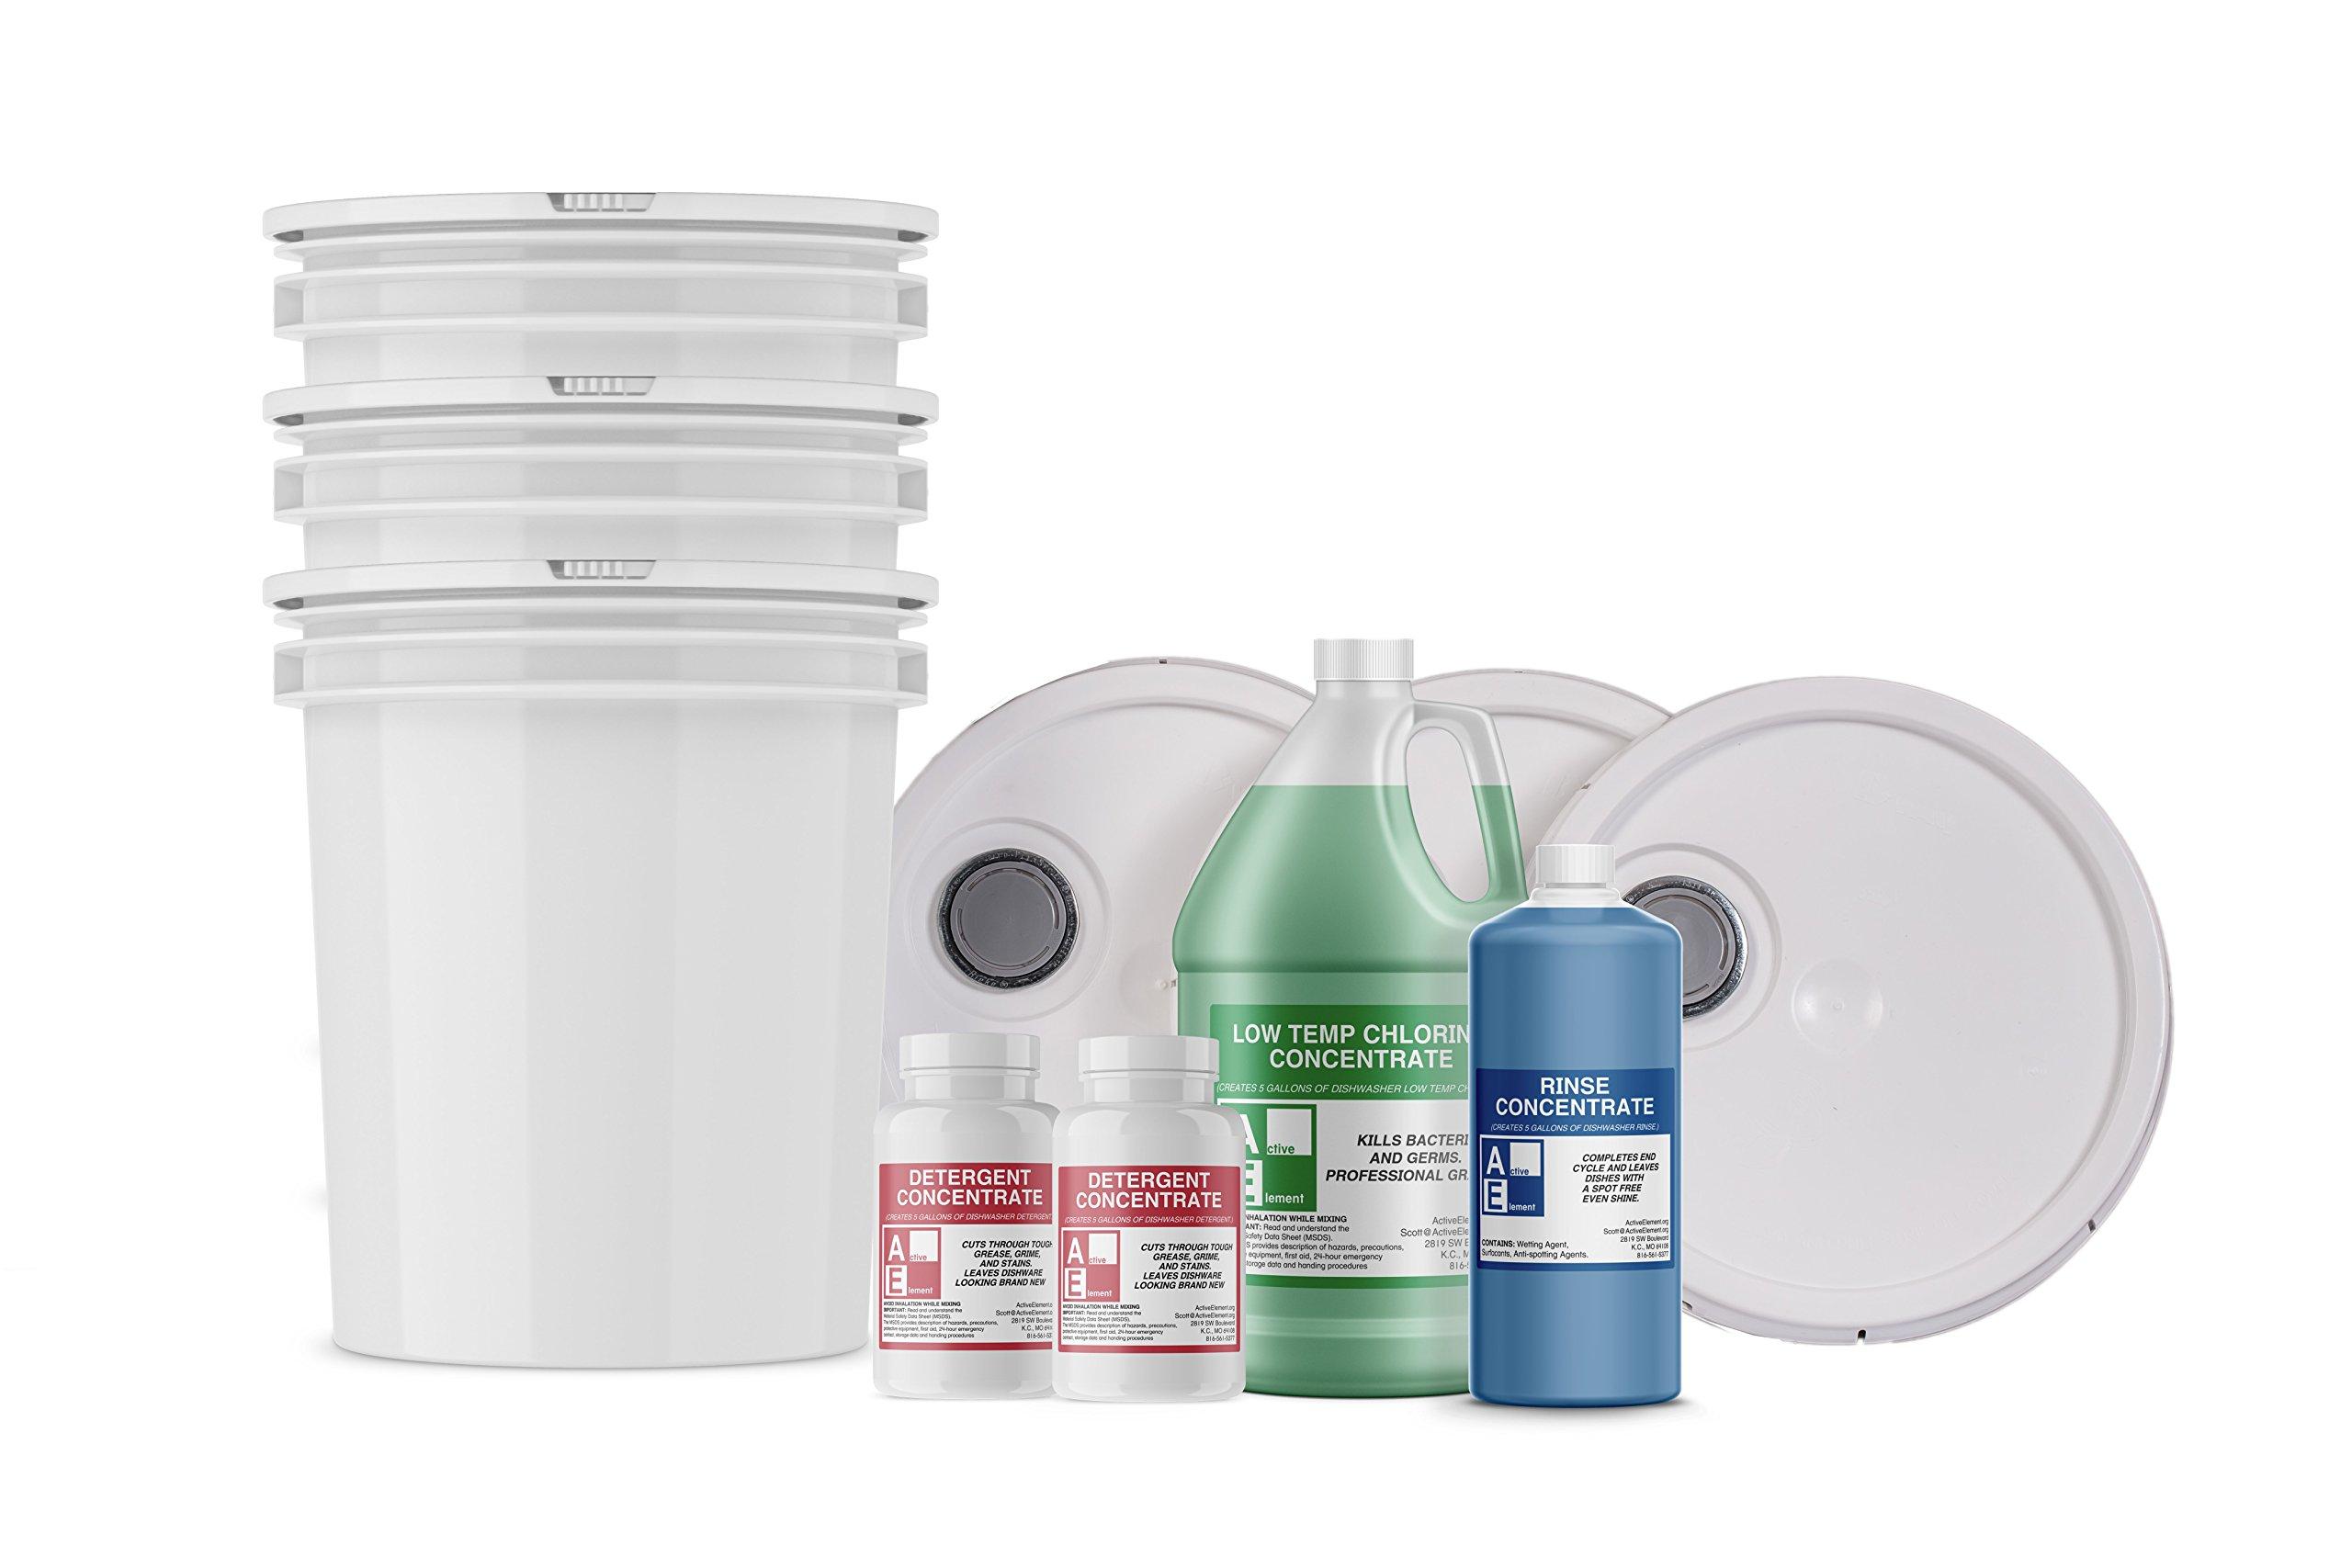 Starter Pack w/buckets (1-detergent, 1-chlorine, 1-rinse), Commercial Grade,